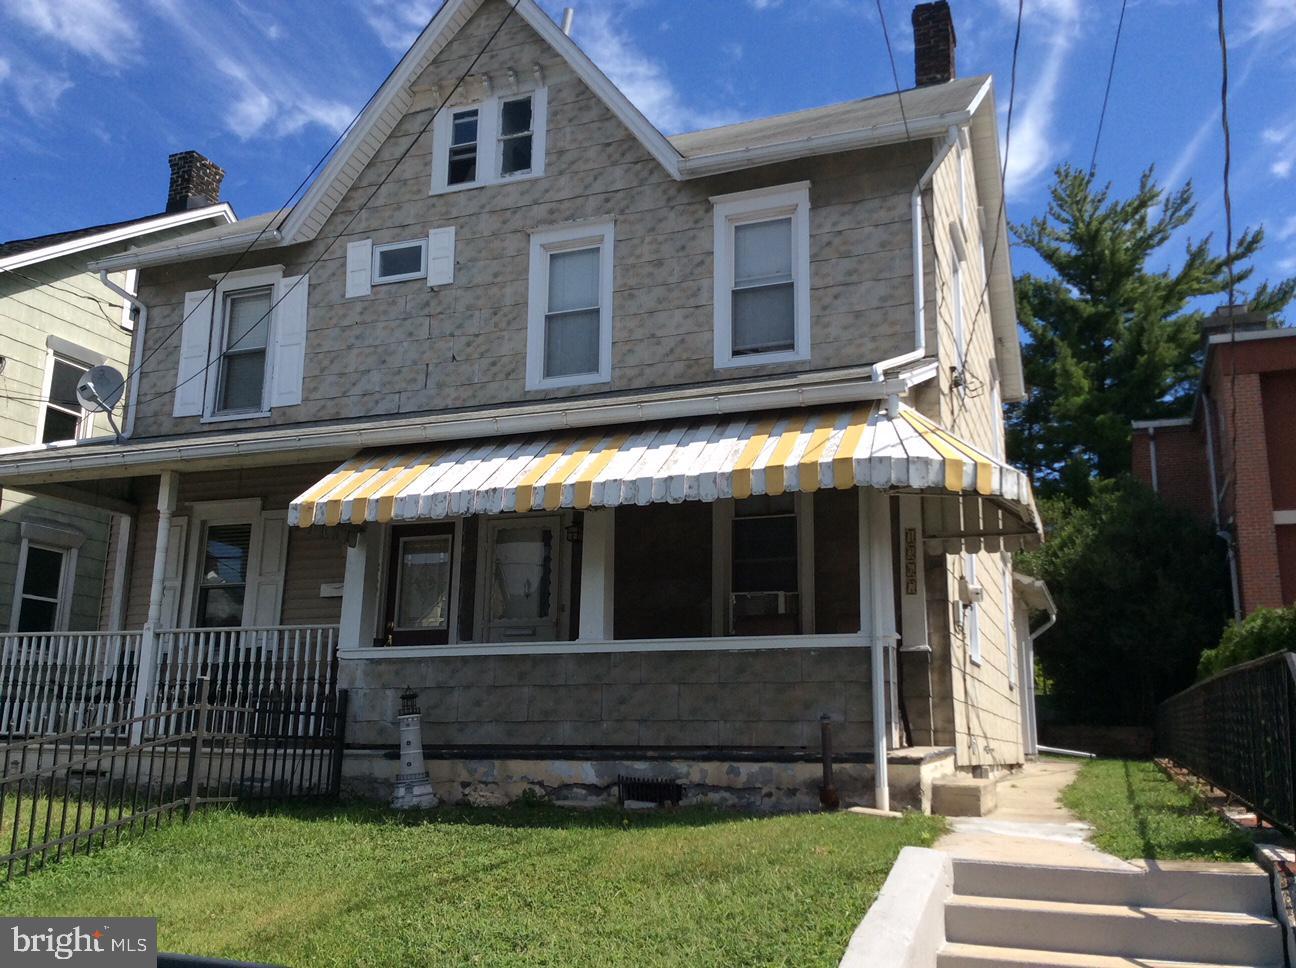 1367 NEWPORT, NORTHAMPTON, PA 18067